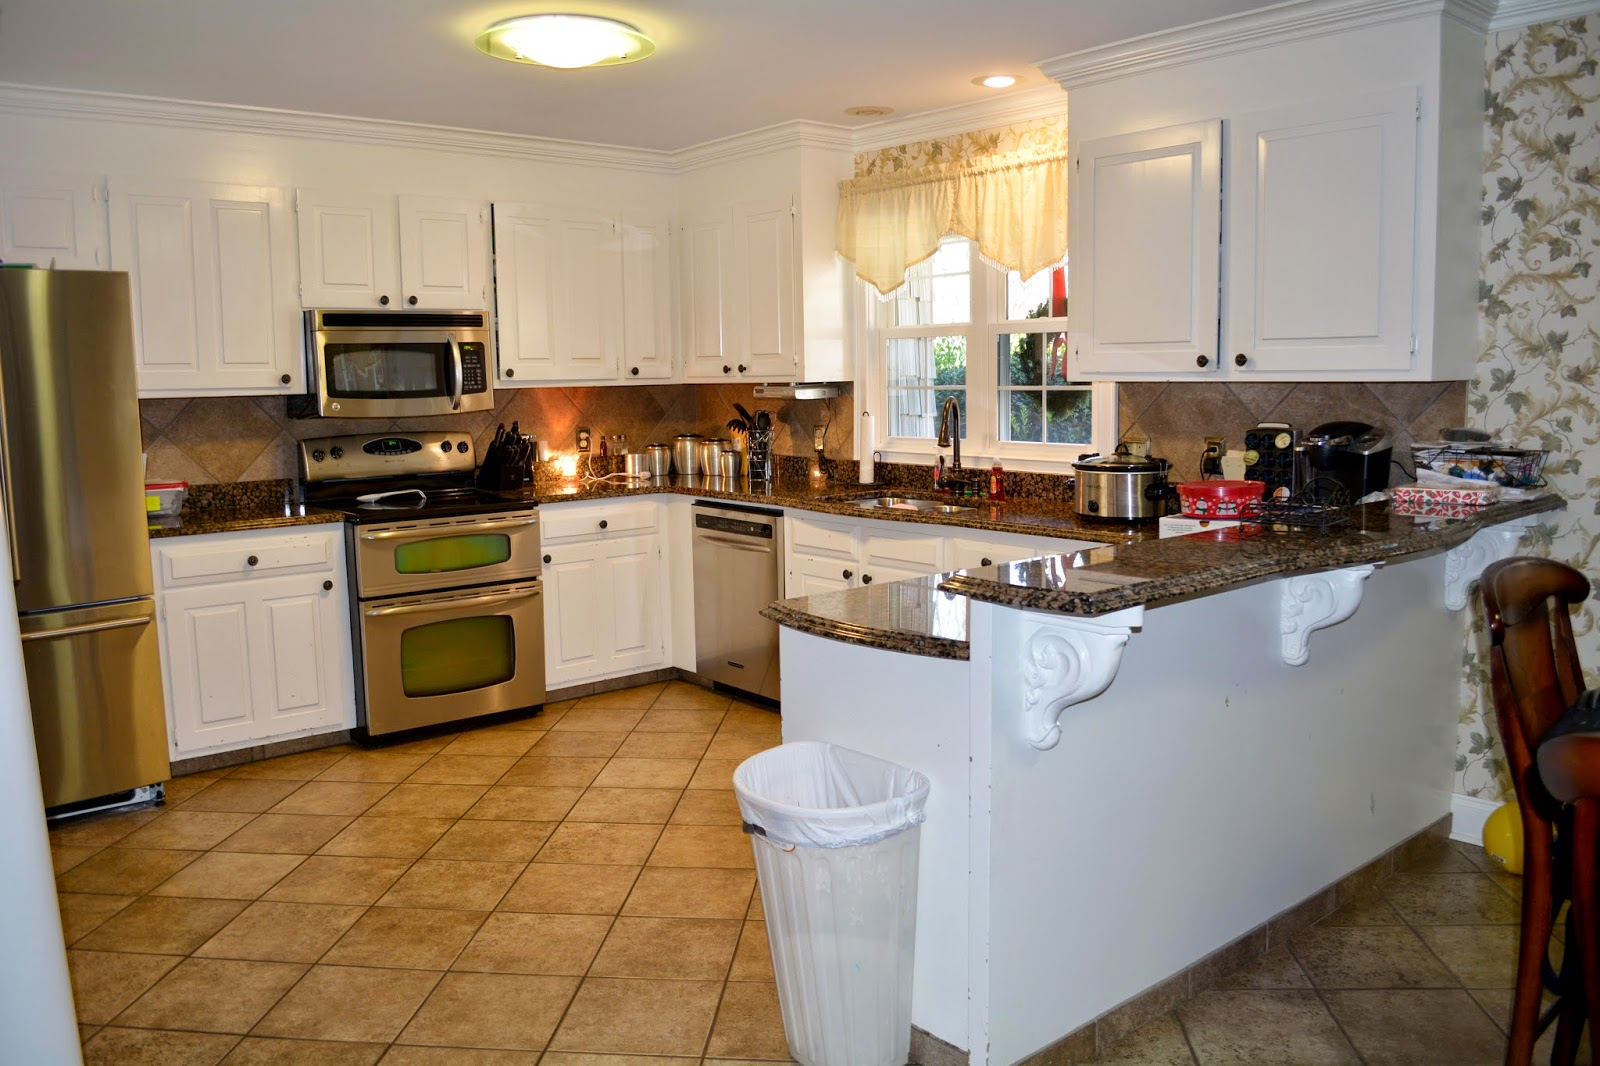 U shaped kitchen layout dimensions for Kustom kitchen designs